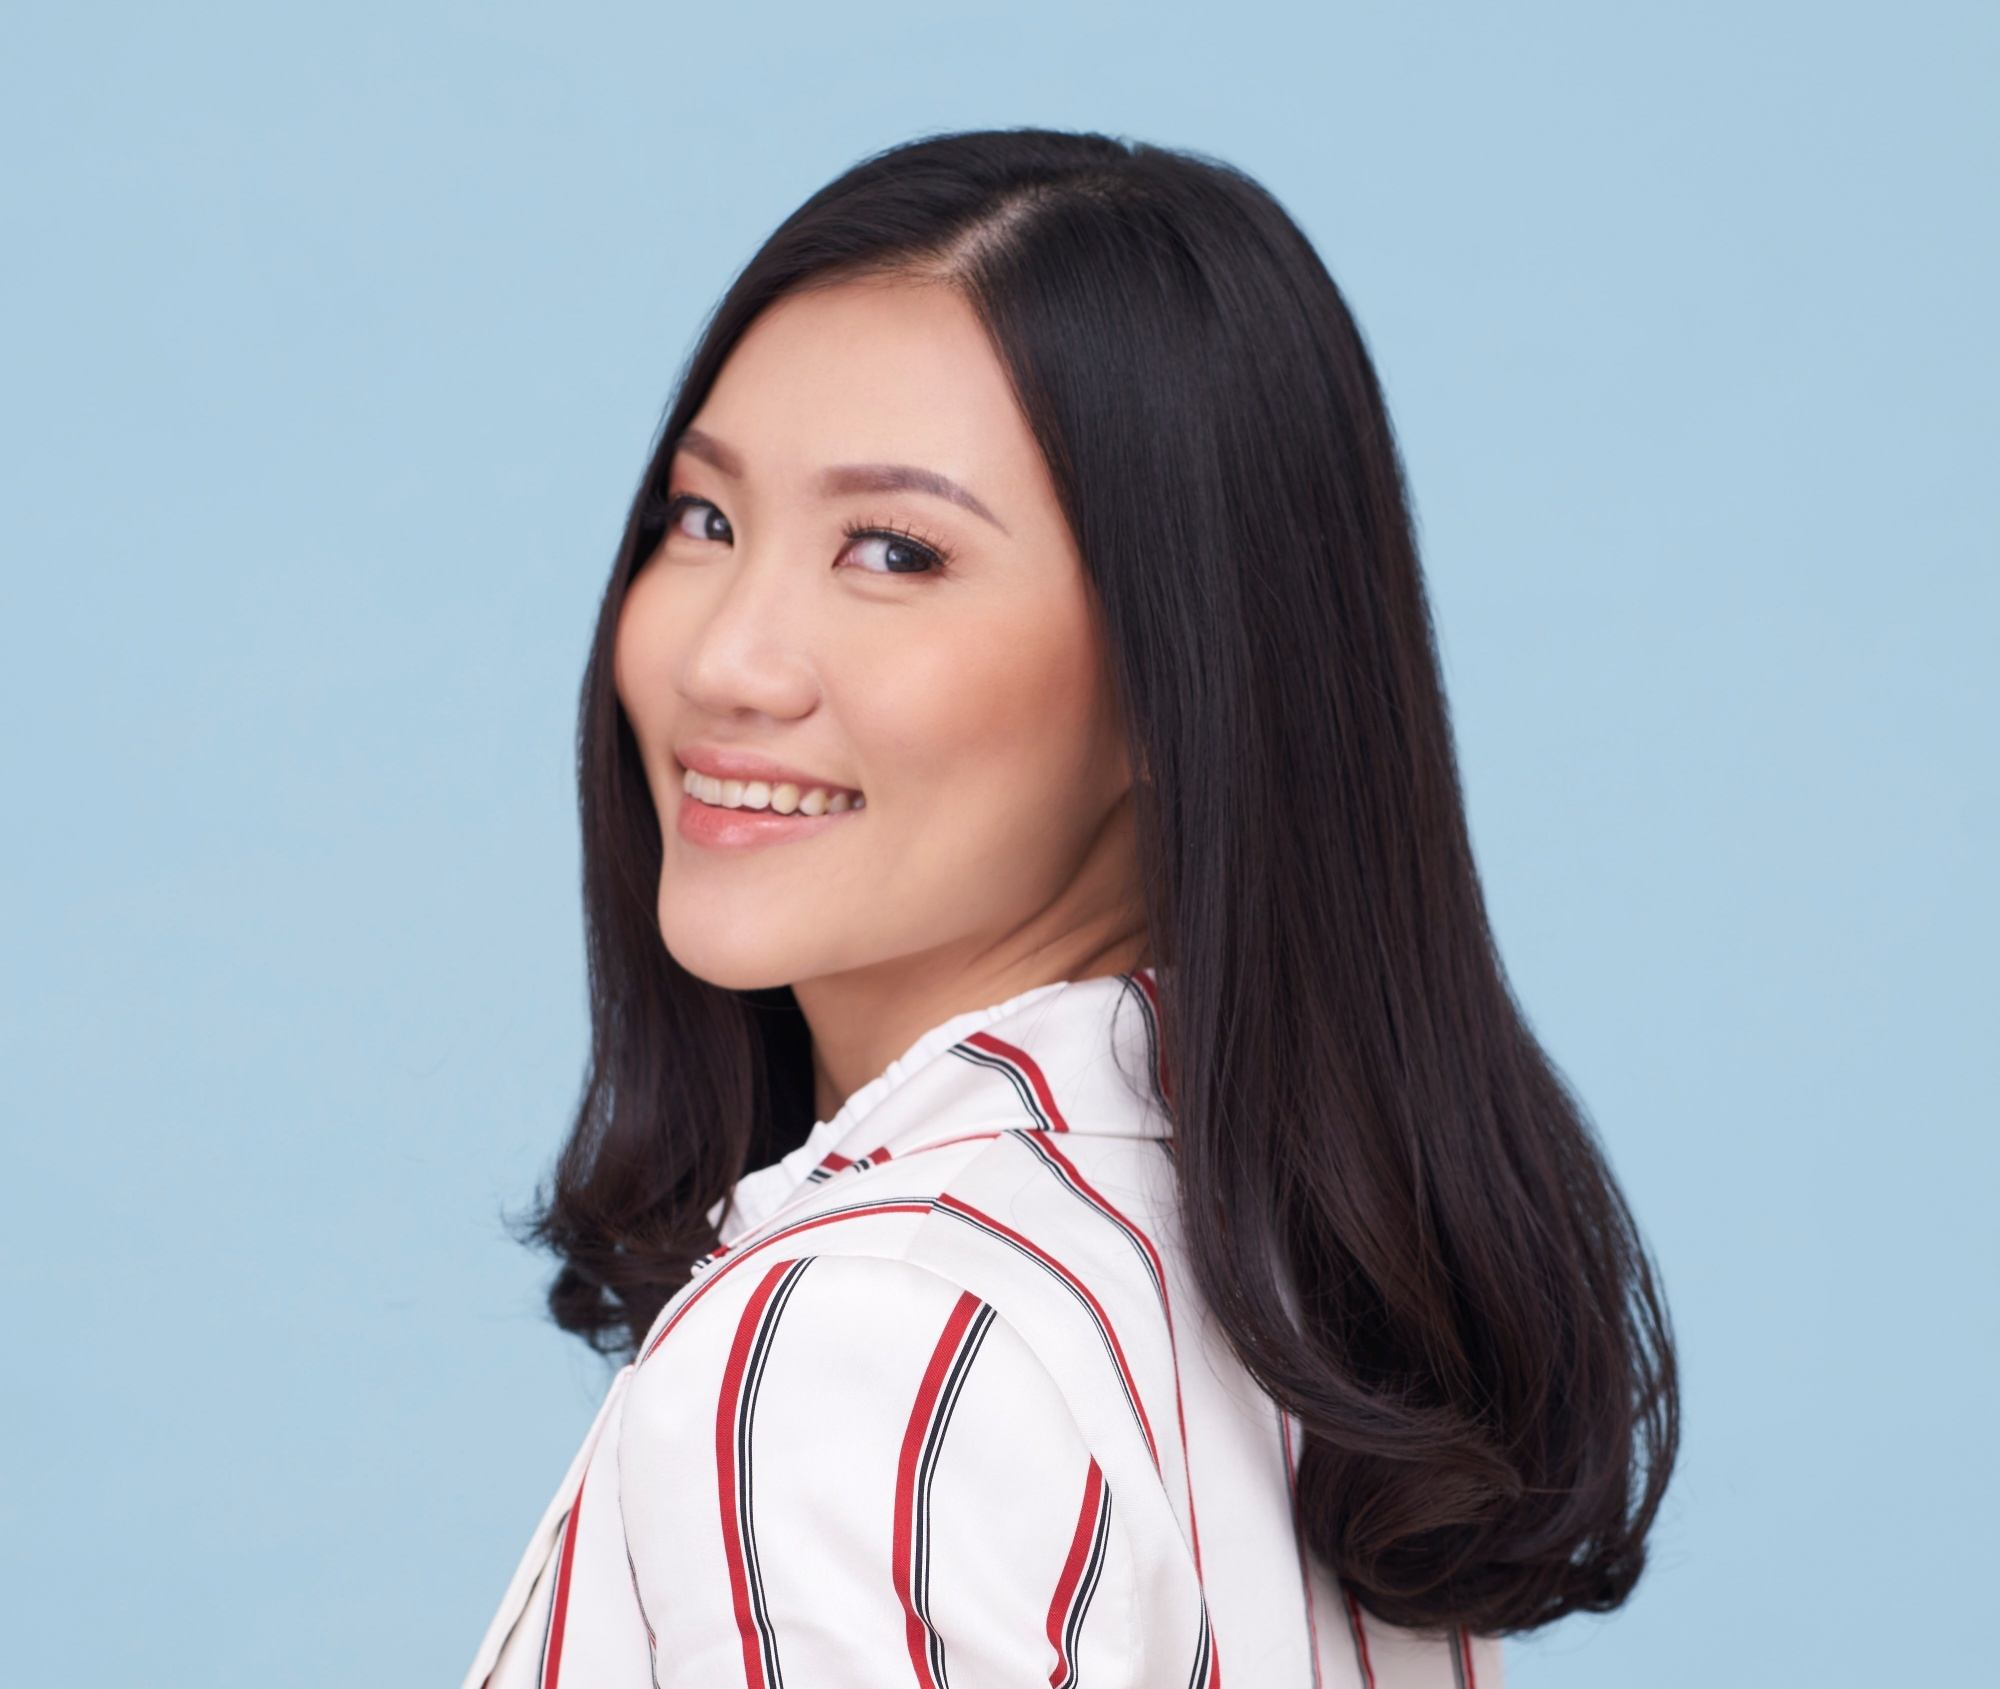 Hair facts: Asian woman with medium-length black looking at the camera